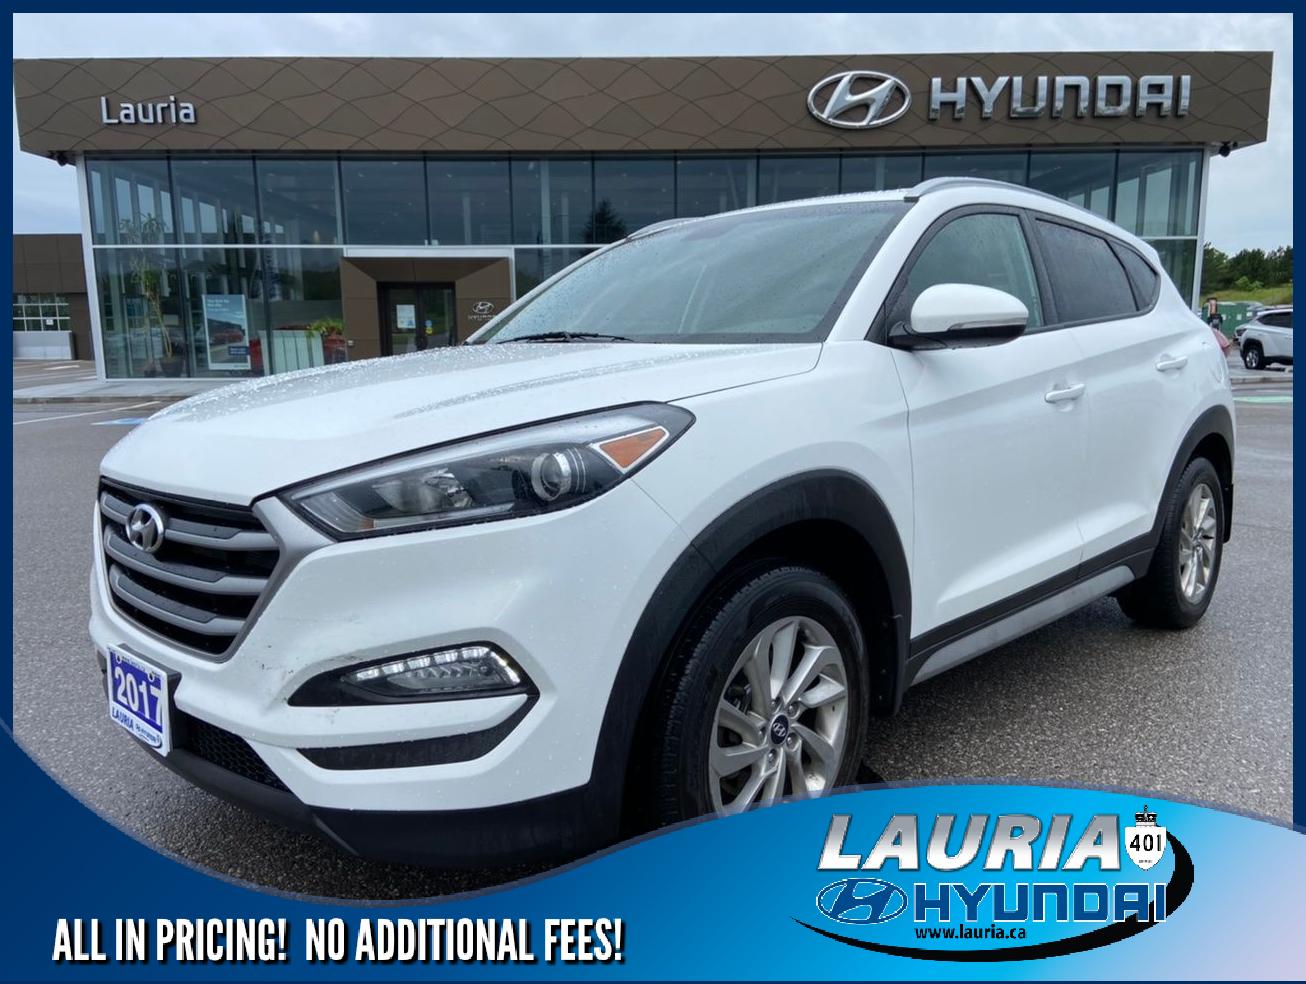 used 2017 Hyundai Tucson car, priced at $15,882